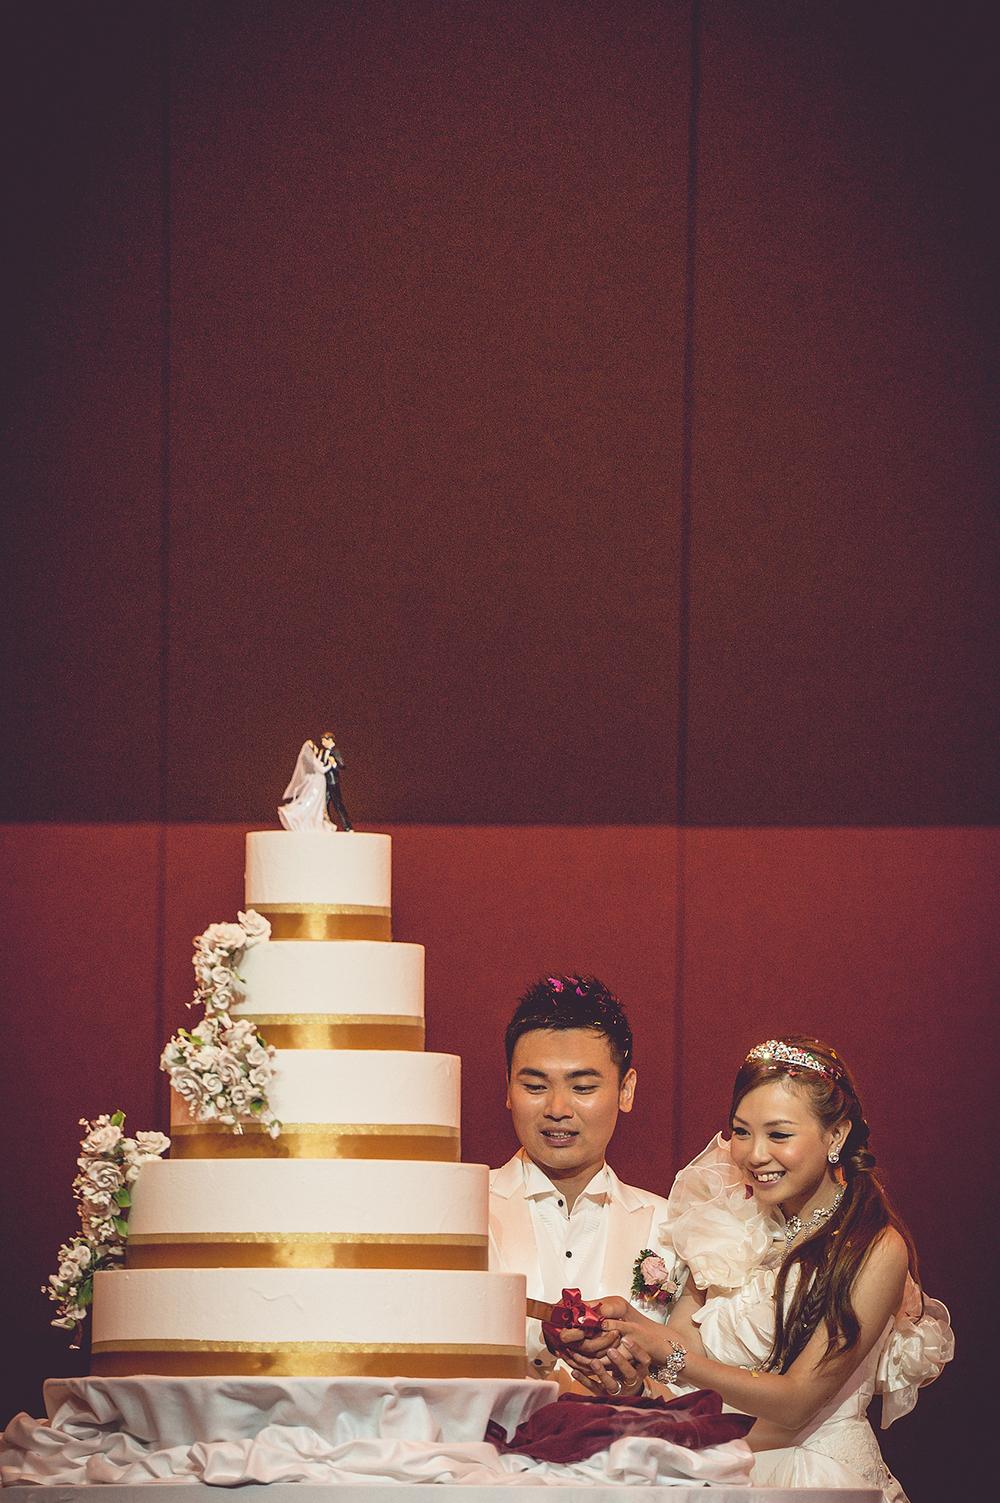 Wedding_Kaden Aerisha4_Kelvin Luffs Photography.jpg.jpg